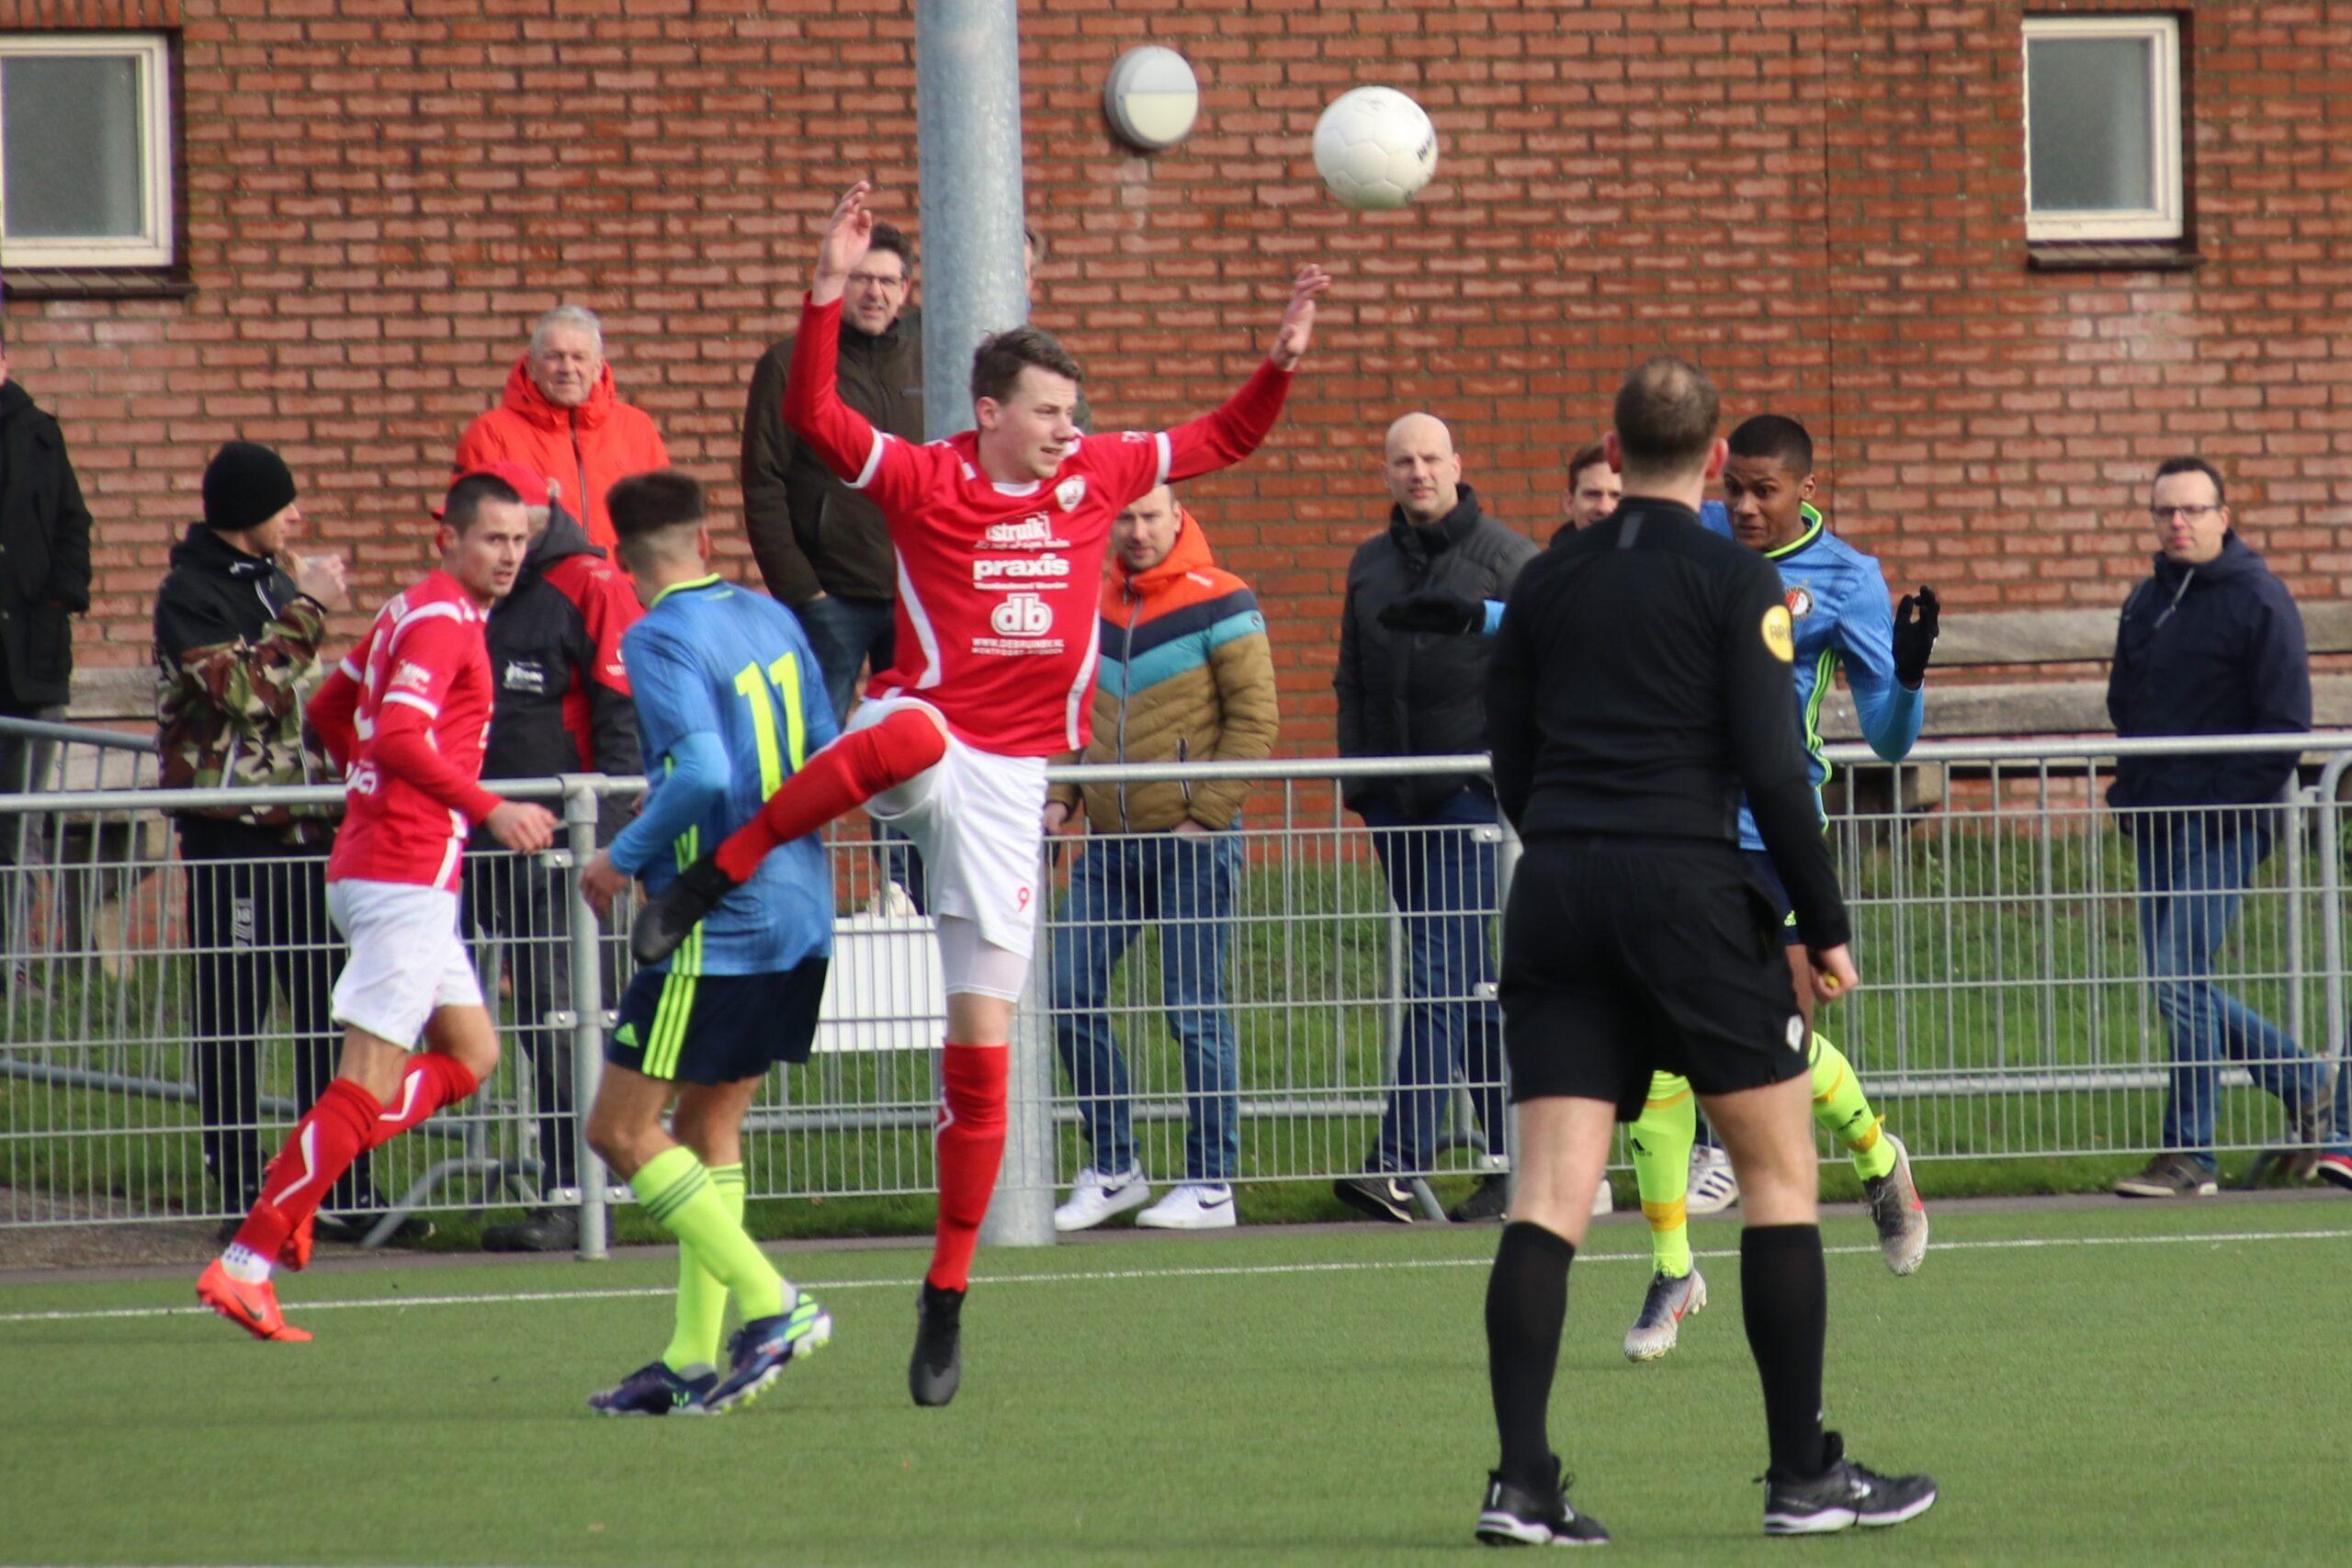 sportlust-46-sc-feyenoord- Mark van der Weijden, Arie Verhagen.